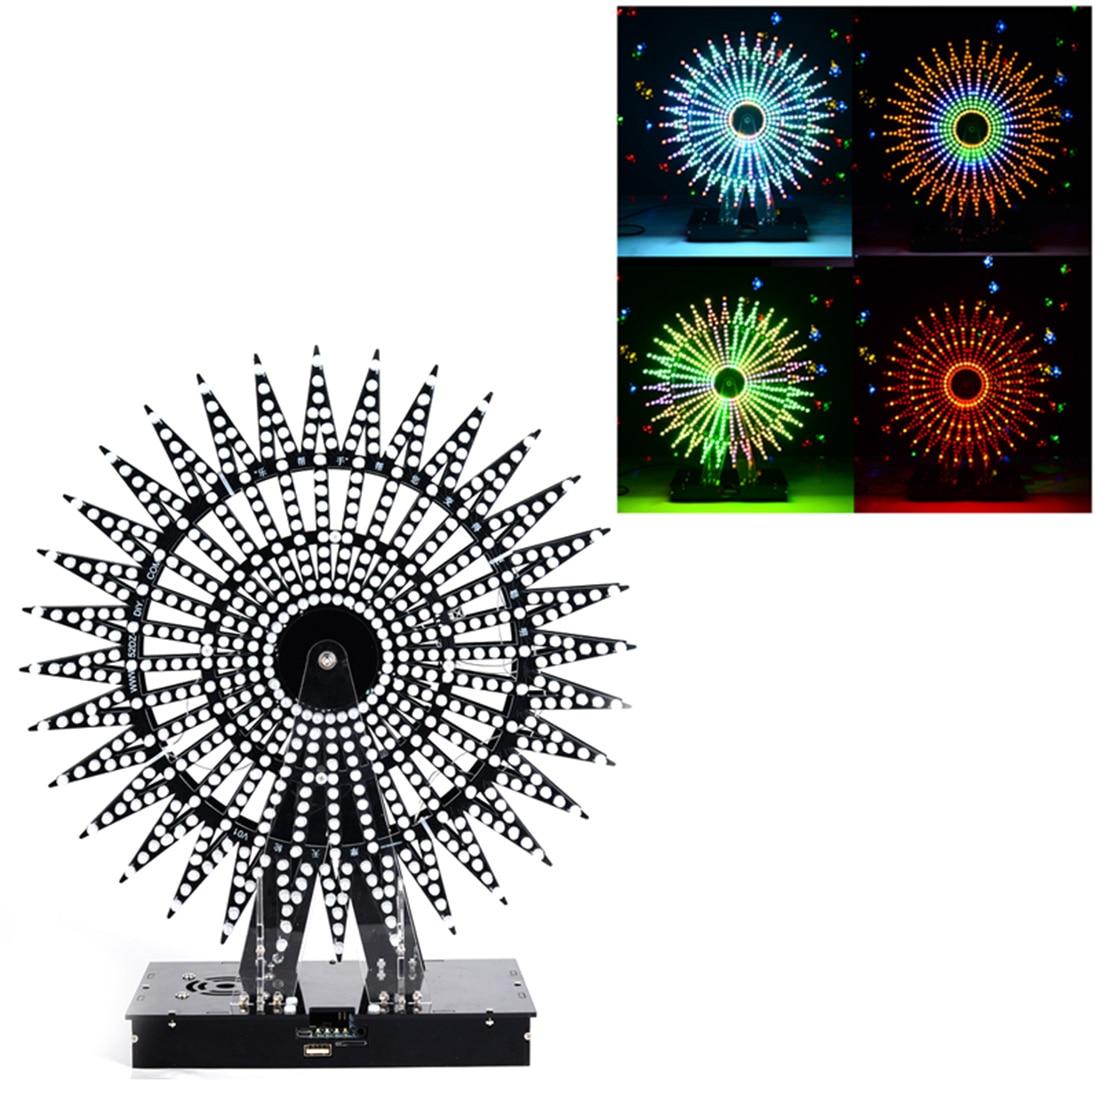 DIY Ferris Wheel Model LED Light Kit Remote Control Music Spectrum Electronic Kit 51 Single-Chip LED Kit For Children Kids Toys